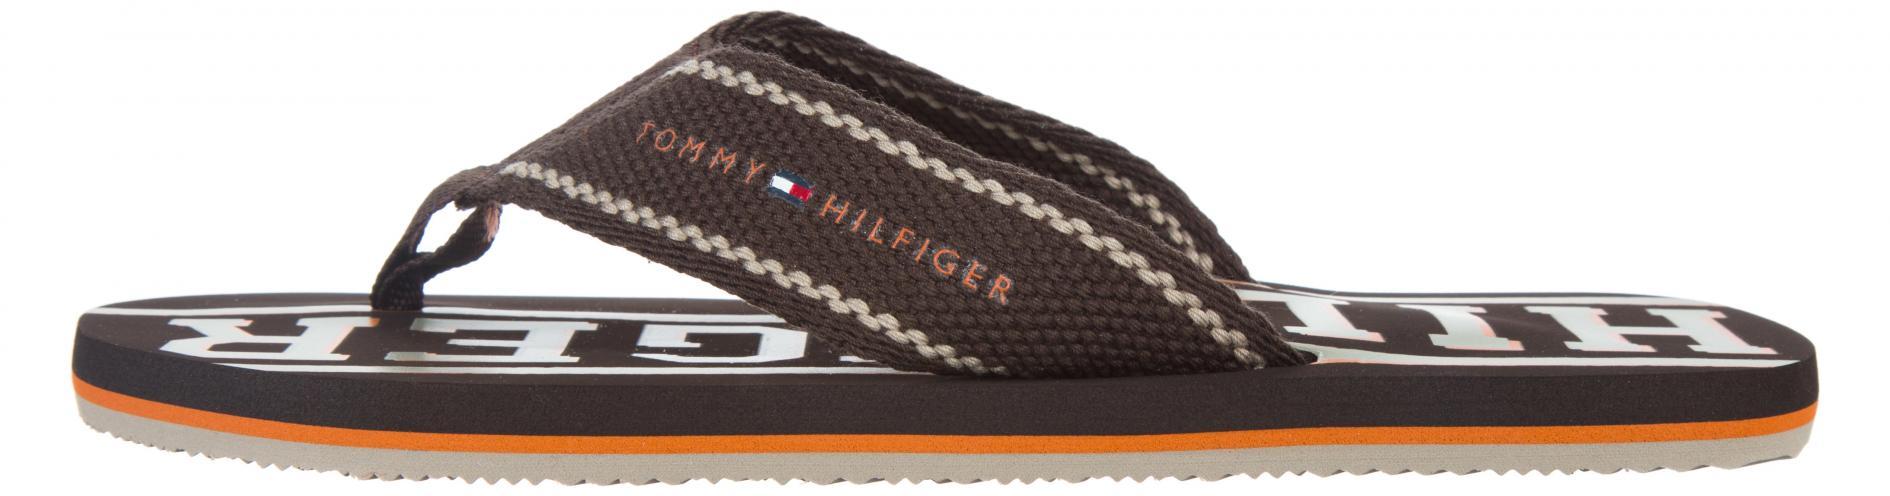 Floyd 13D Žabky Tommy Hilfiger 3209b215b1